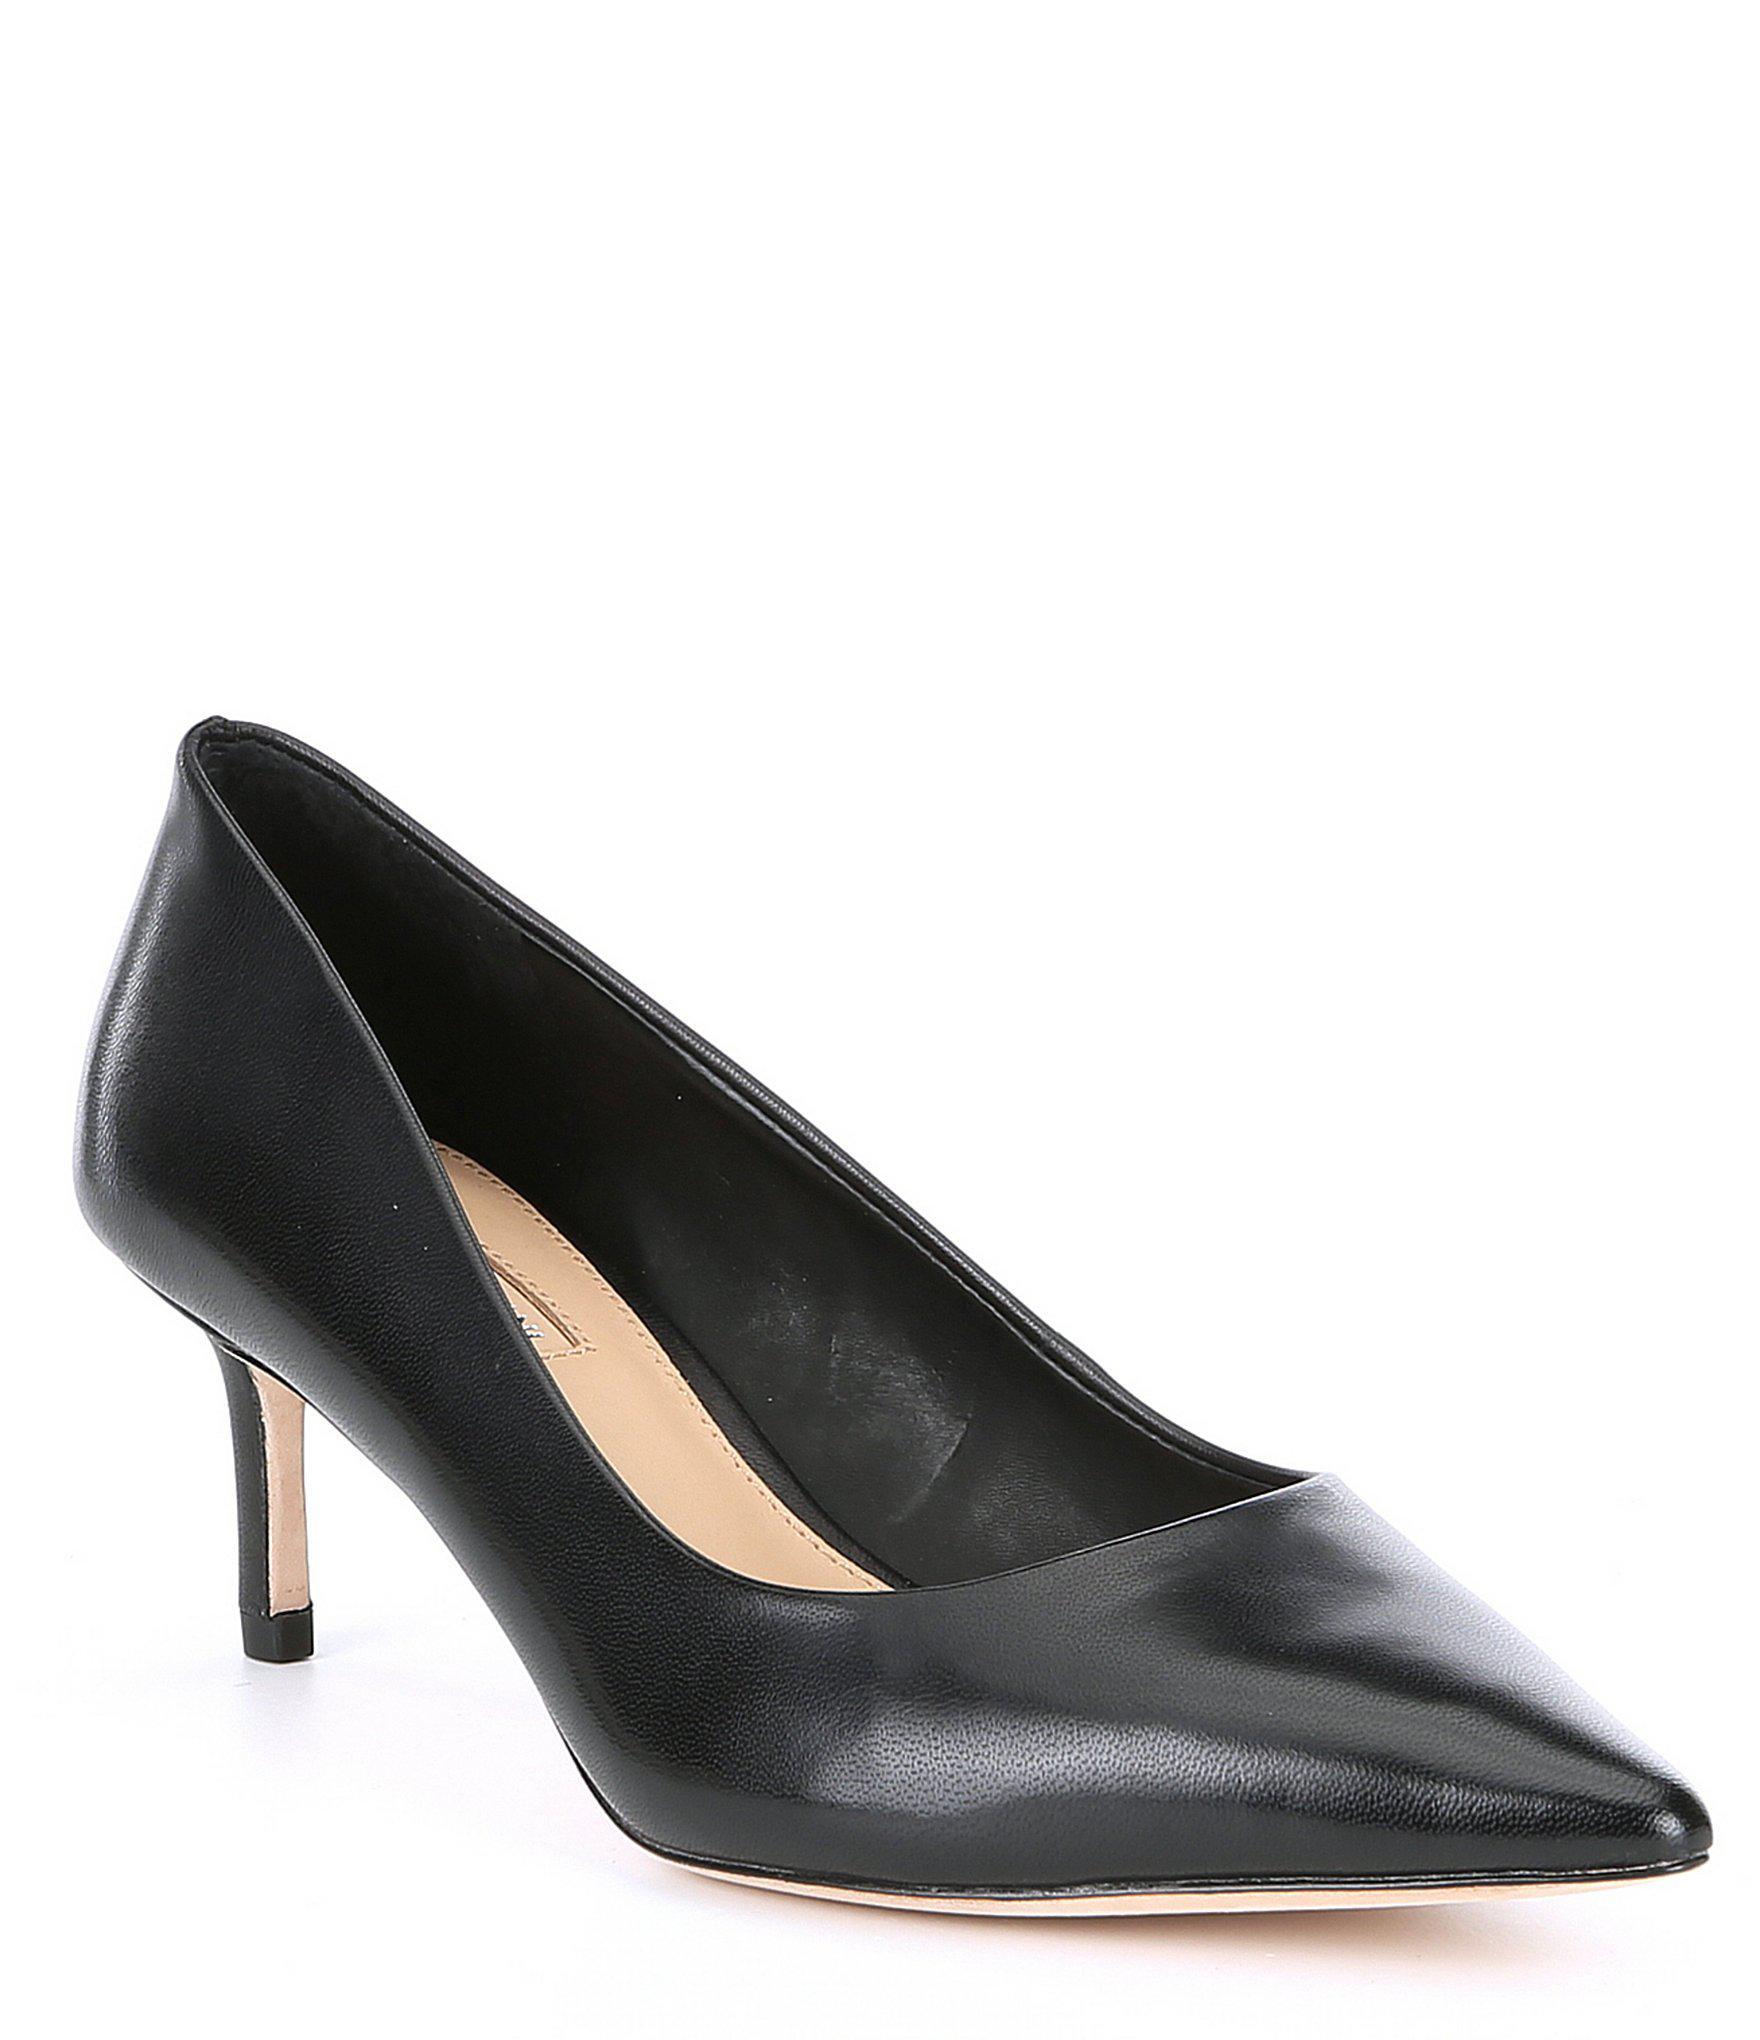 6da9992f417 Lyst - Antonio Melani Ermmie Mid Heel Pumps in Black